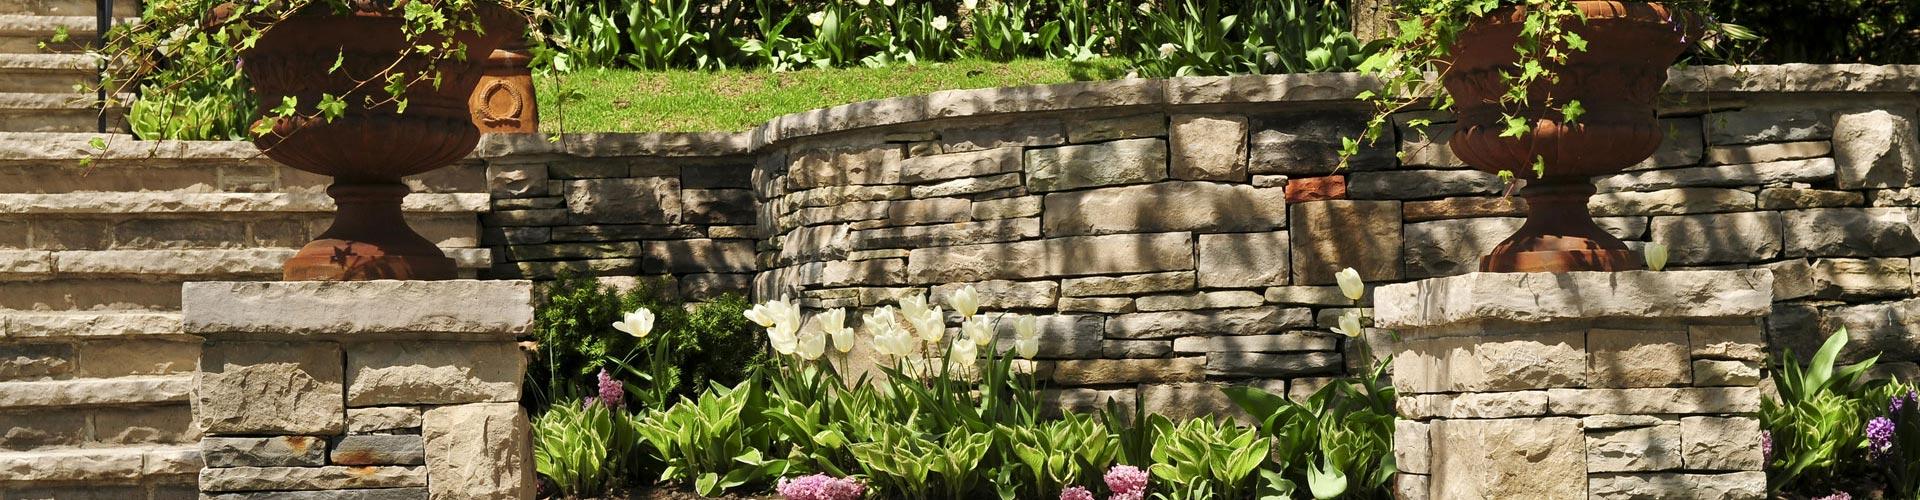 retaining walls in a garden